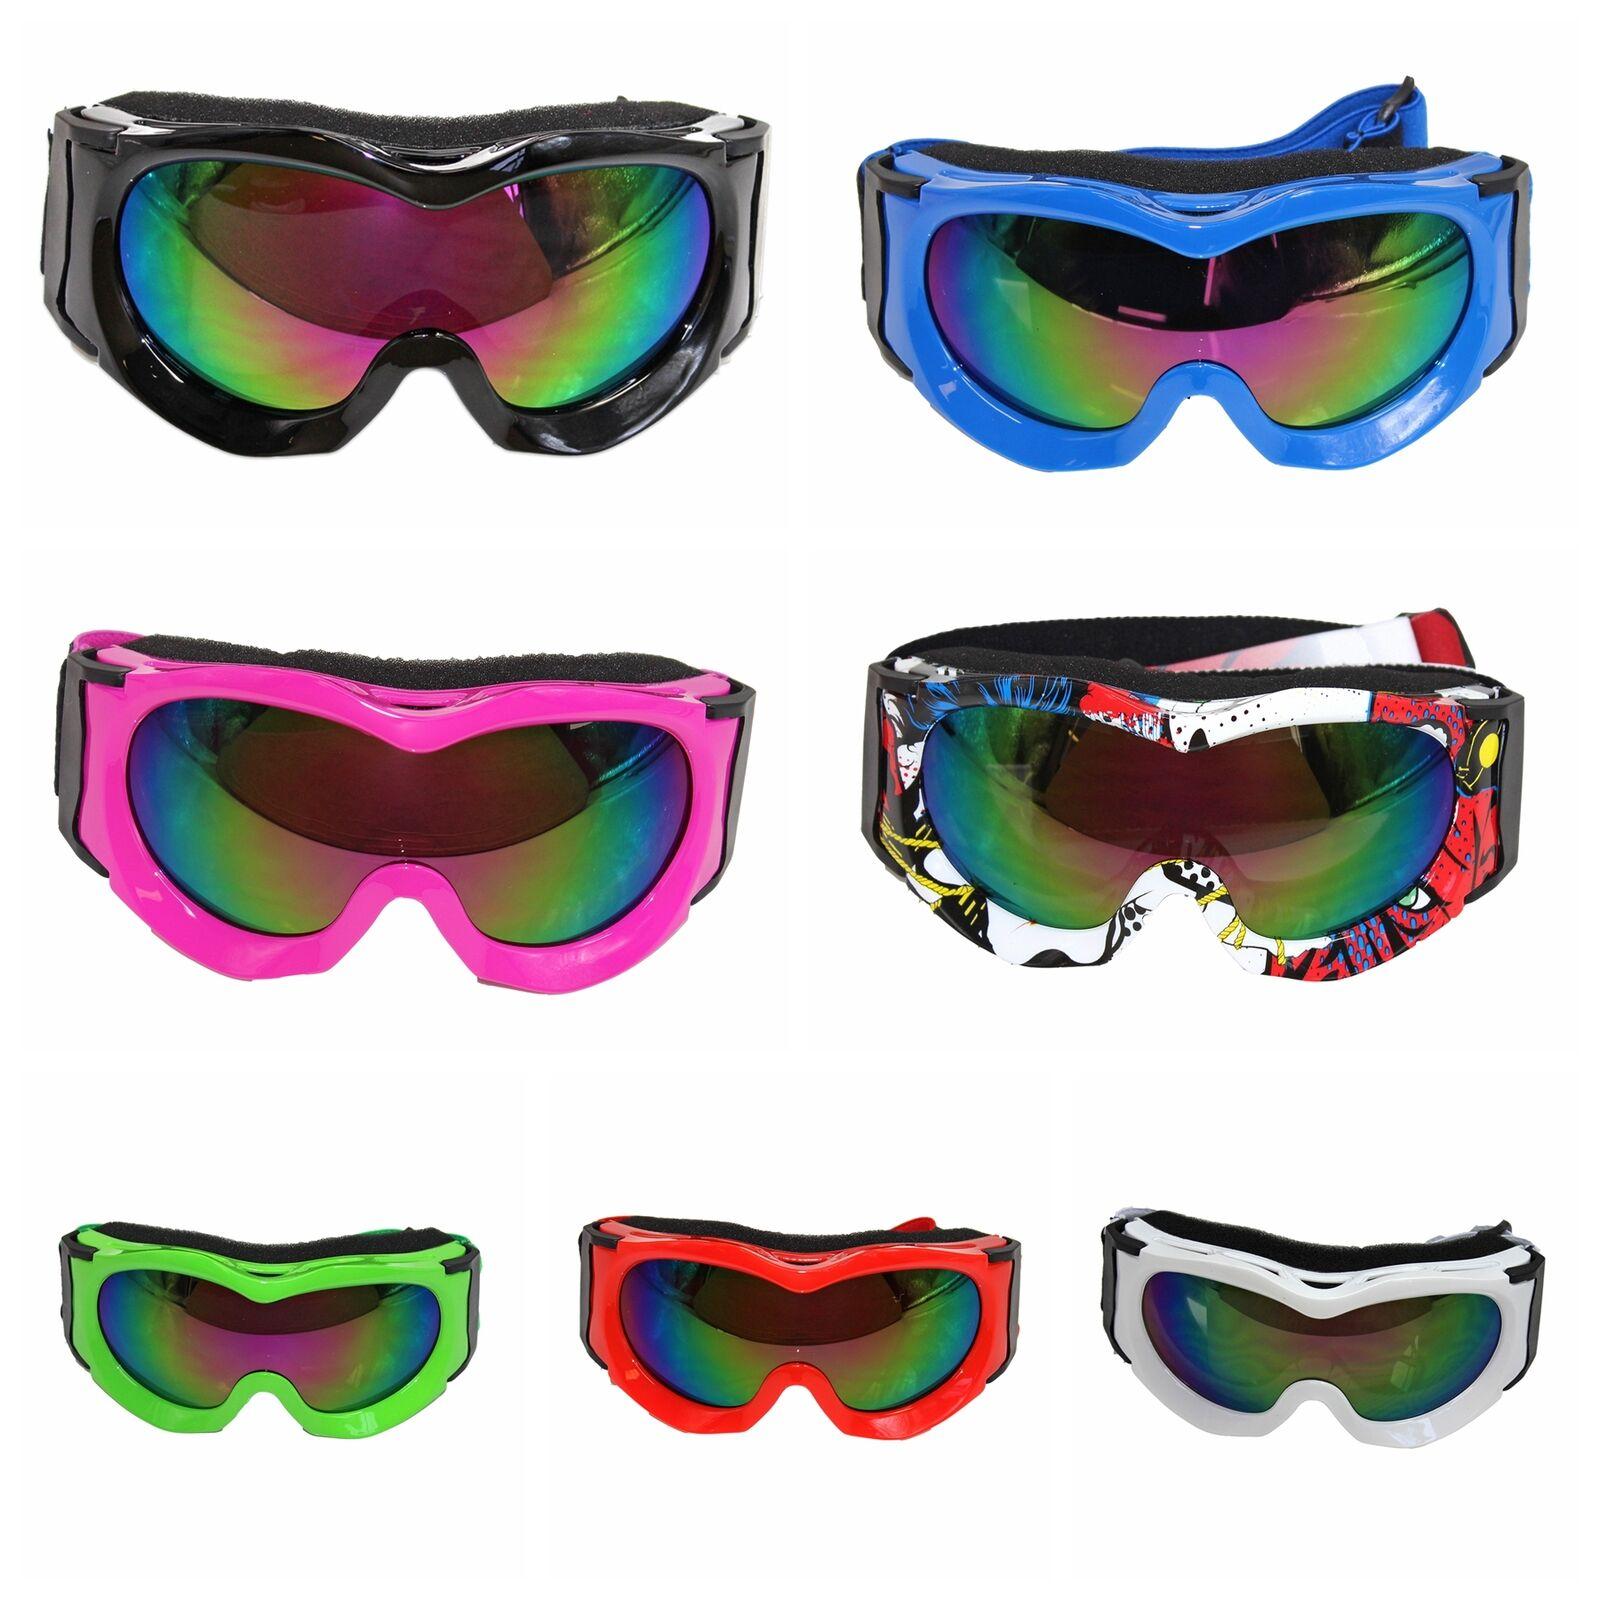 Motocross Motorcycle ATV Bike Road Racing Ski Goggles Glasses Eyewear FASHION